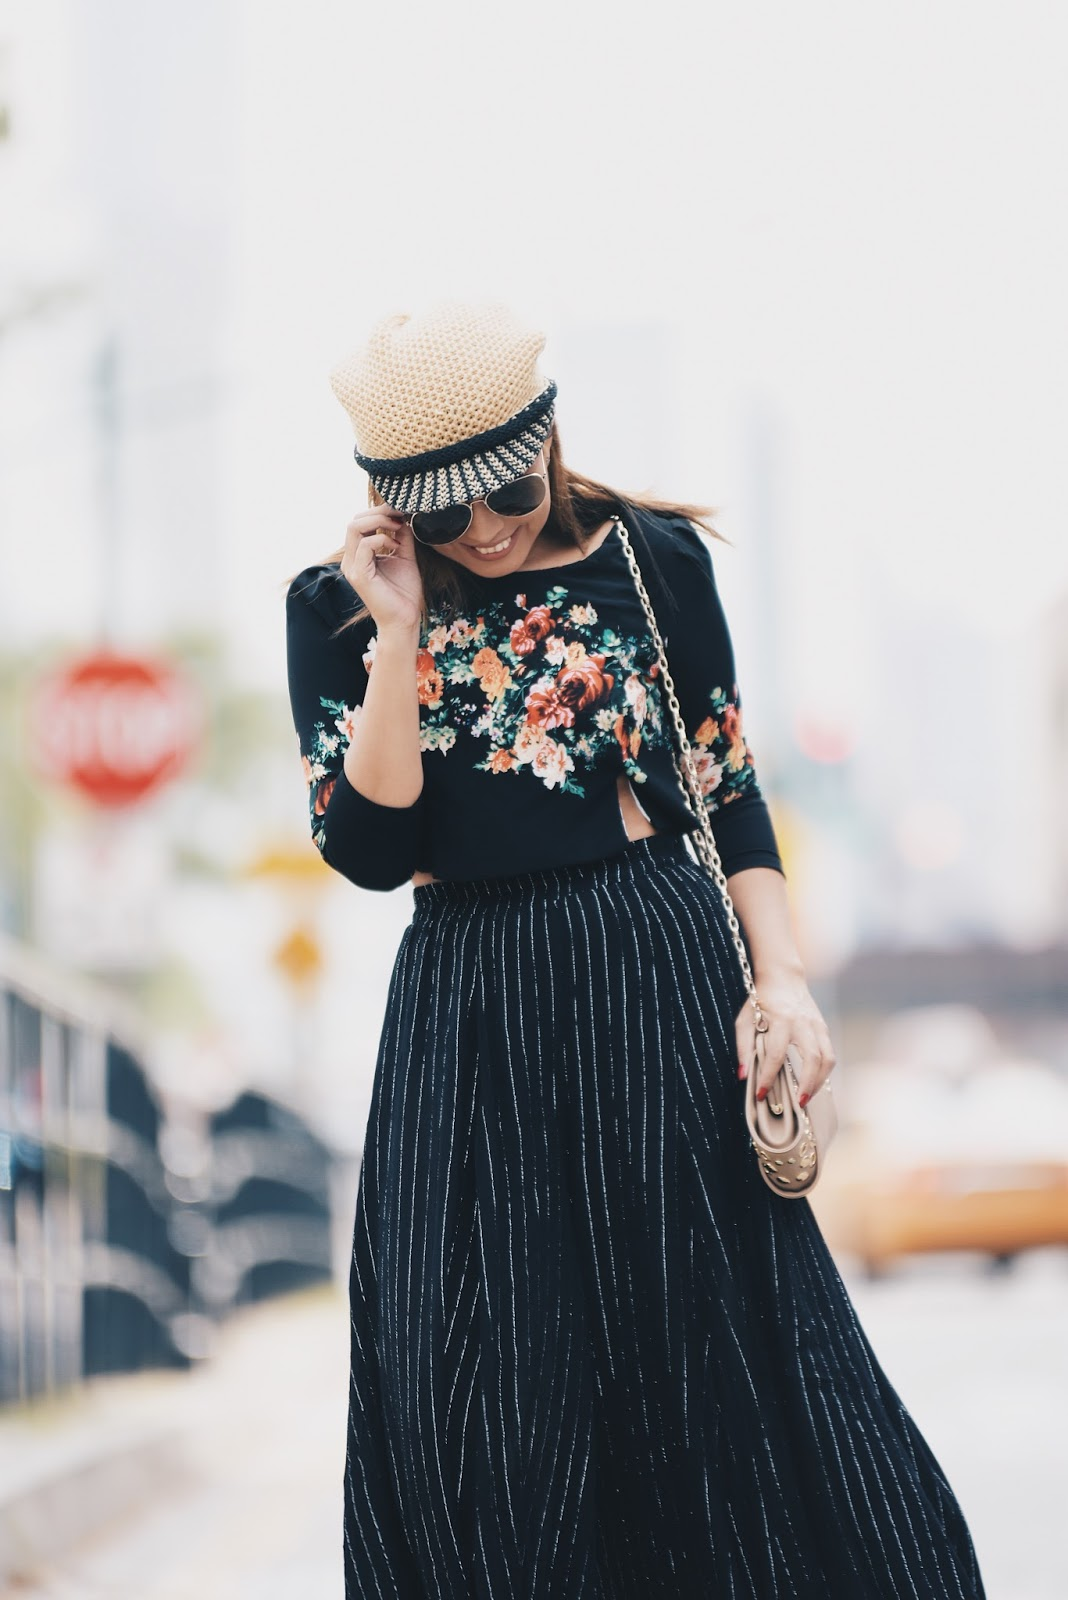 NYFW - Spring-Summer 2018 Runway Show by Mari Estilo-look of the day-streetstyle-fashion week-moda el salvador-latinabloggers-dcblogger-armandhugon